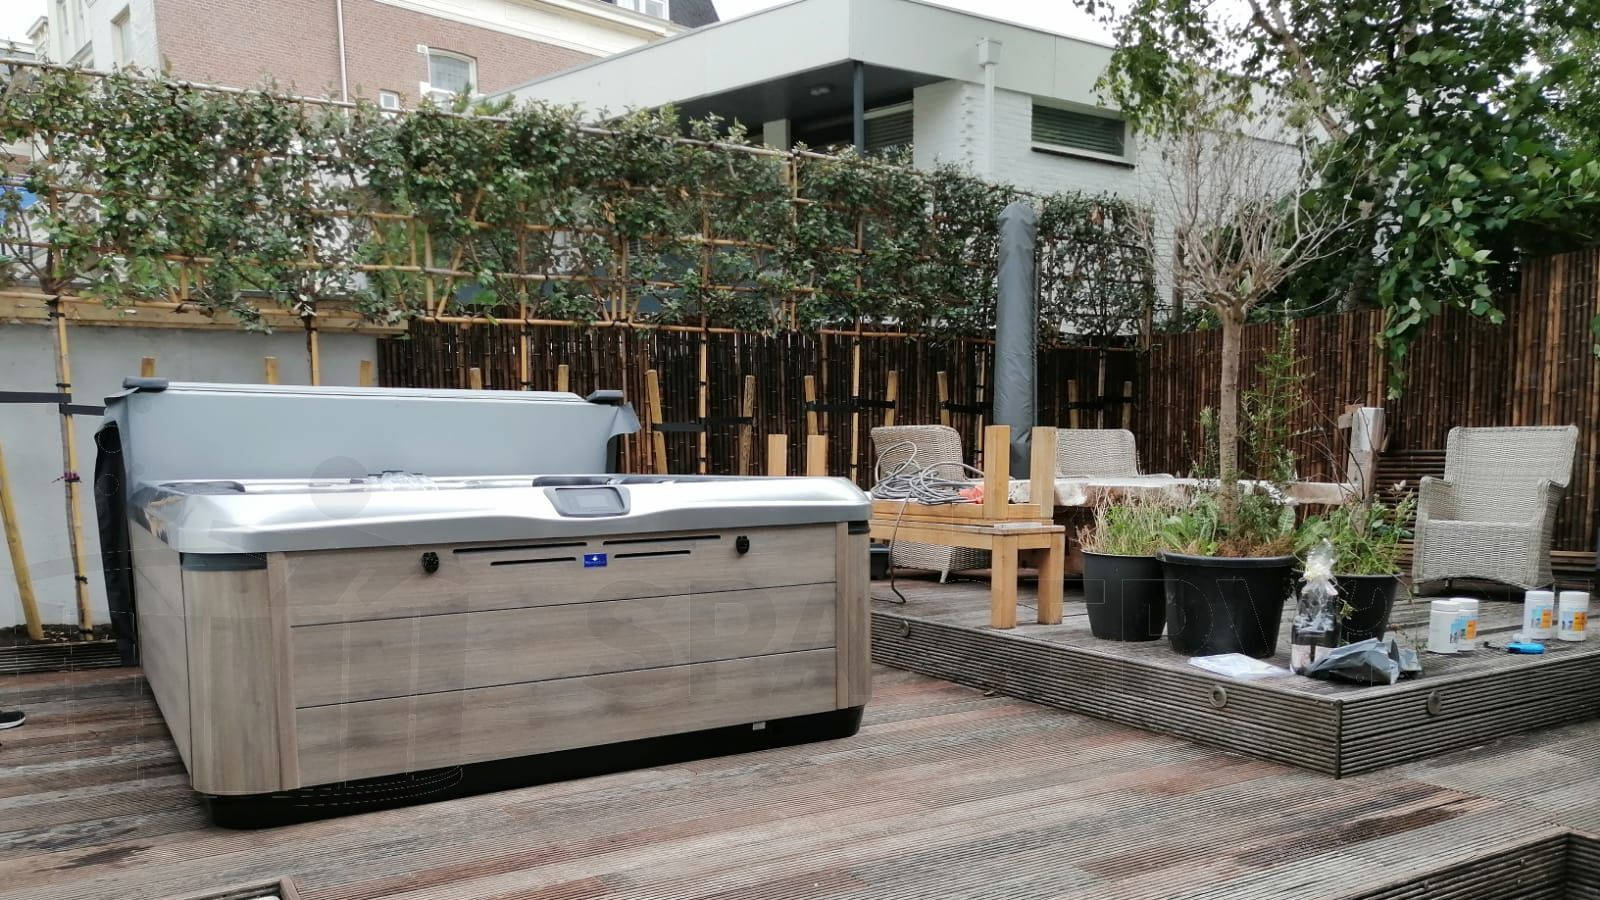 Plaatsing van een Villeroy & Boch A9L spa in Den Haag